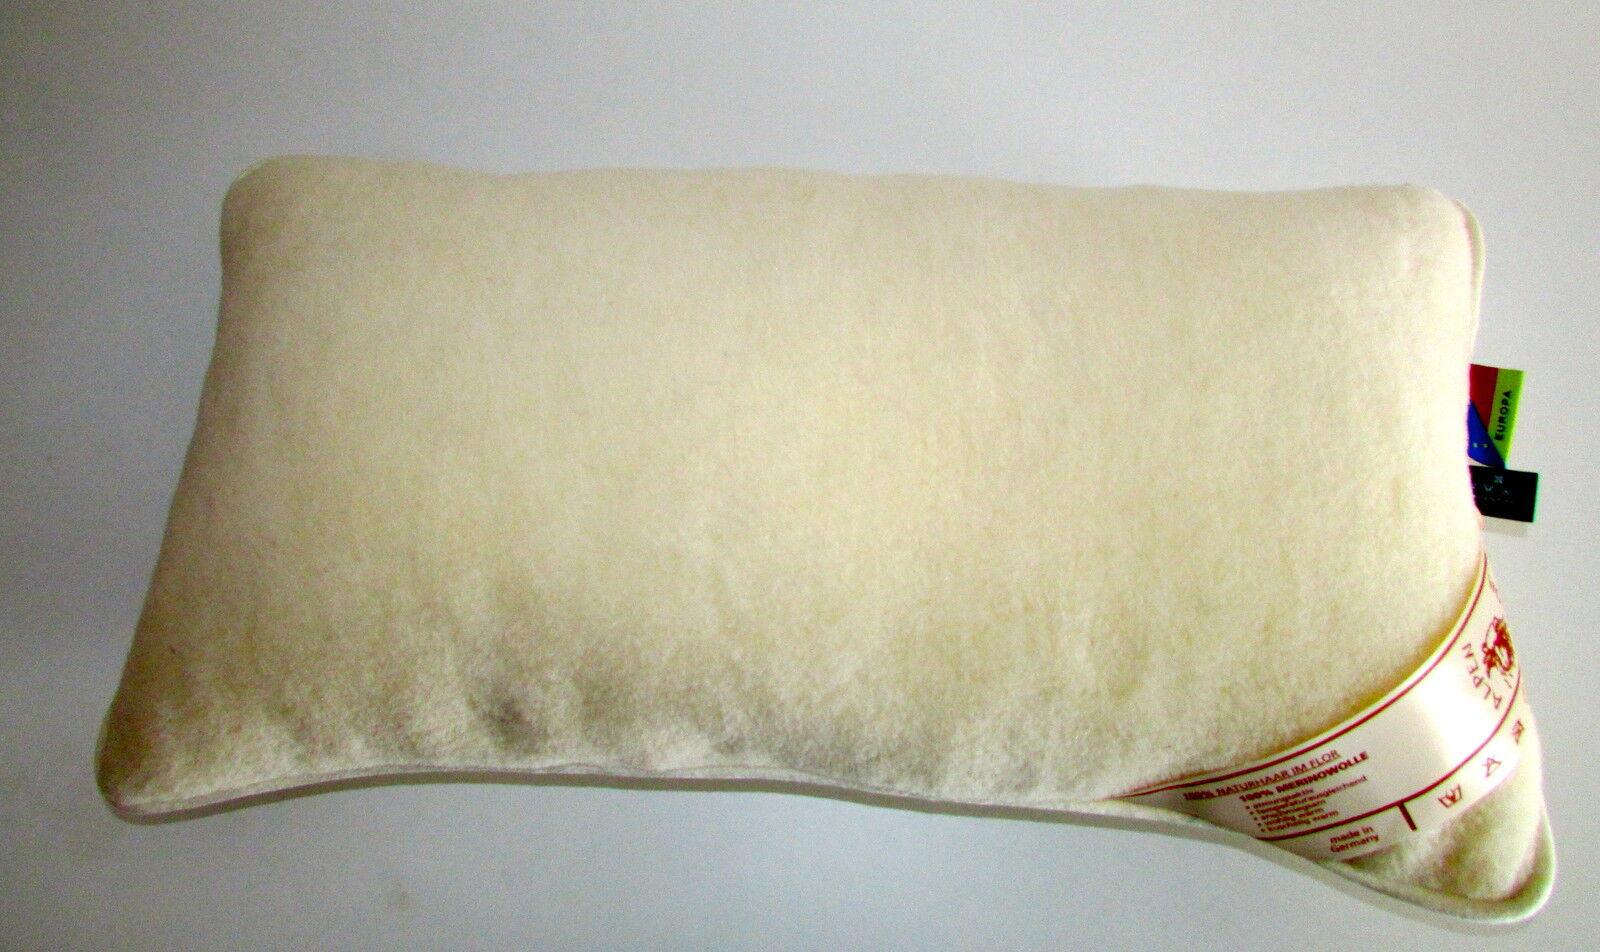 Cuscino Poggiatesta di Lana per Dormire 100% Merino Velour + Imbottitura